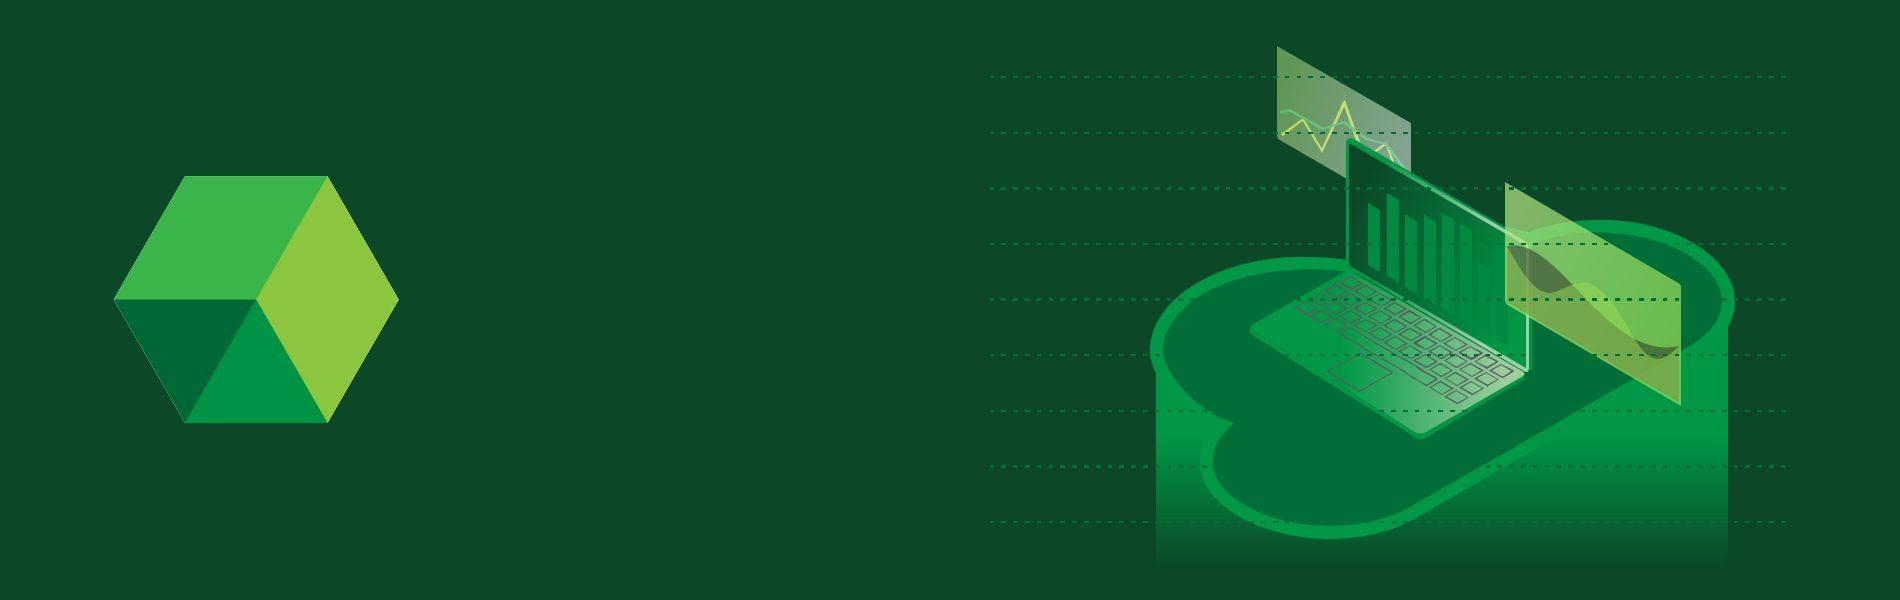 Blog Header Introduction to Stackdriver 1900×600